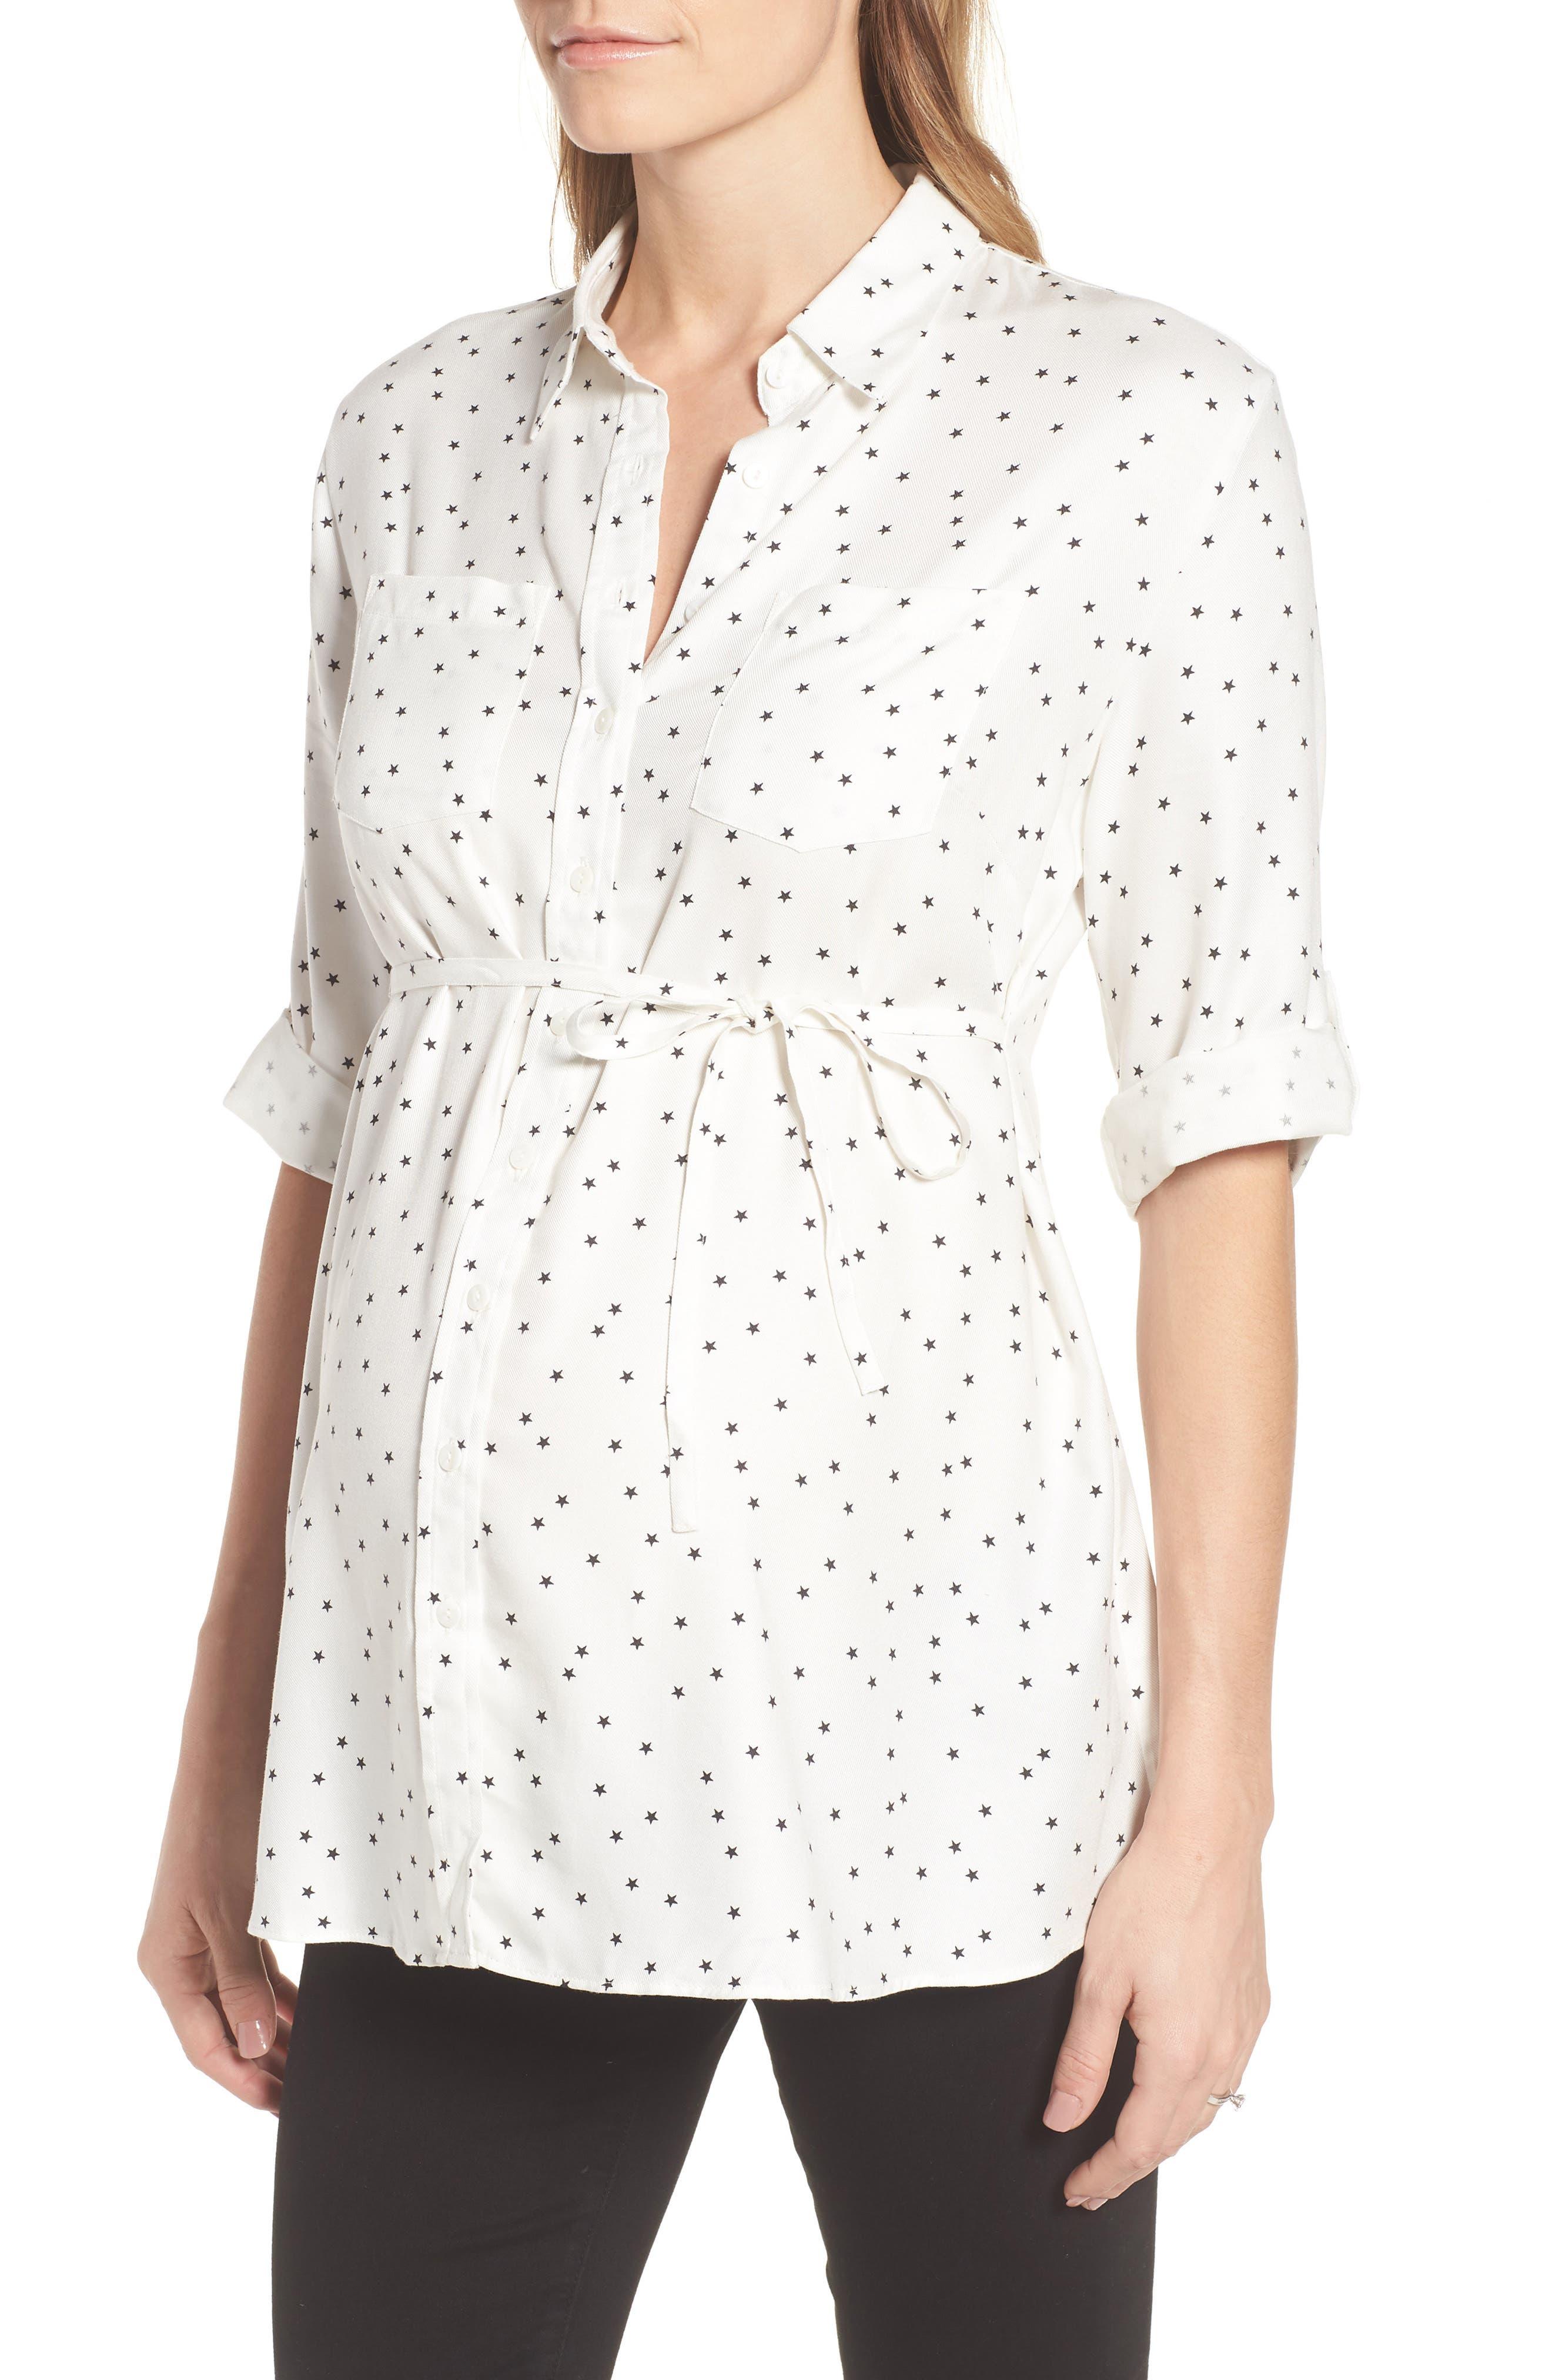 Selina Maternity Shirt,                             Alternate thumbnail 3, color,                             Off White Star Print